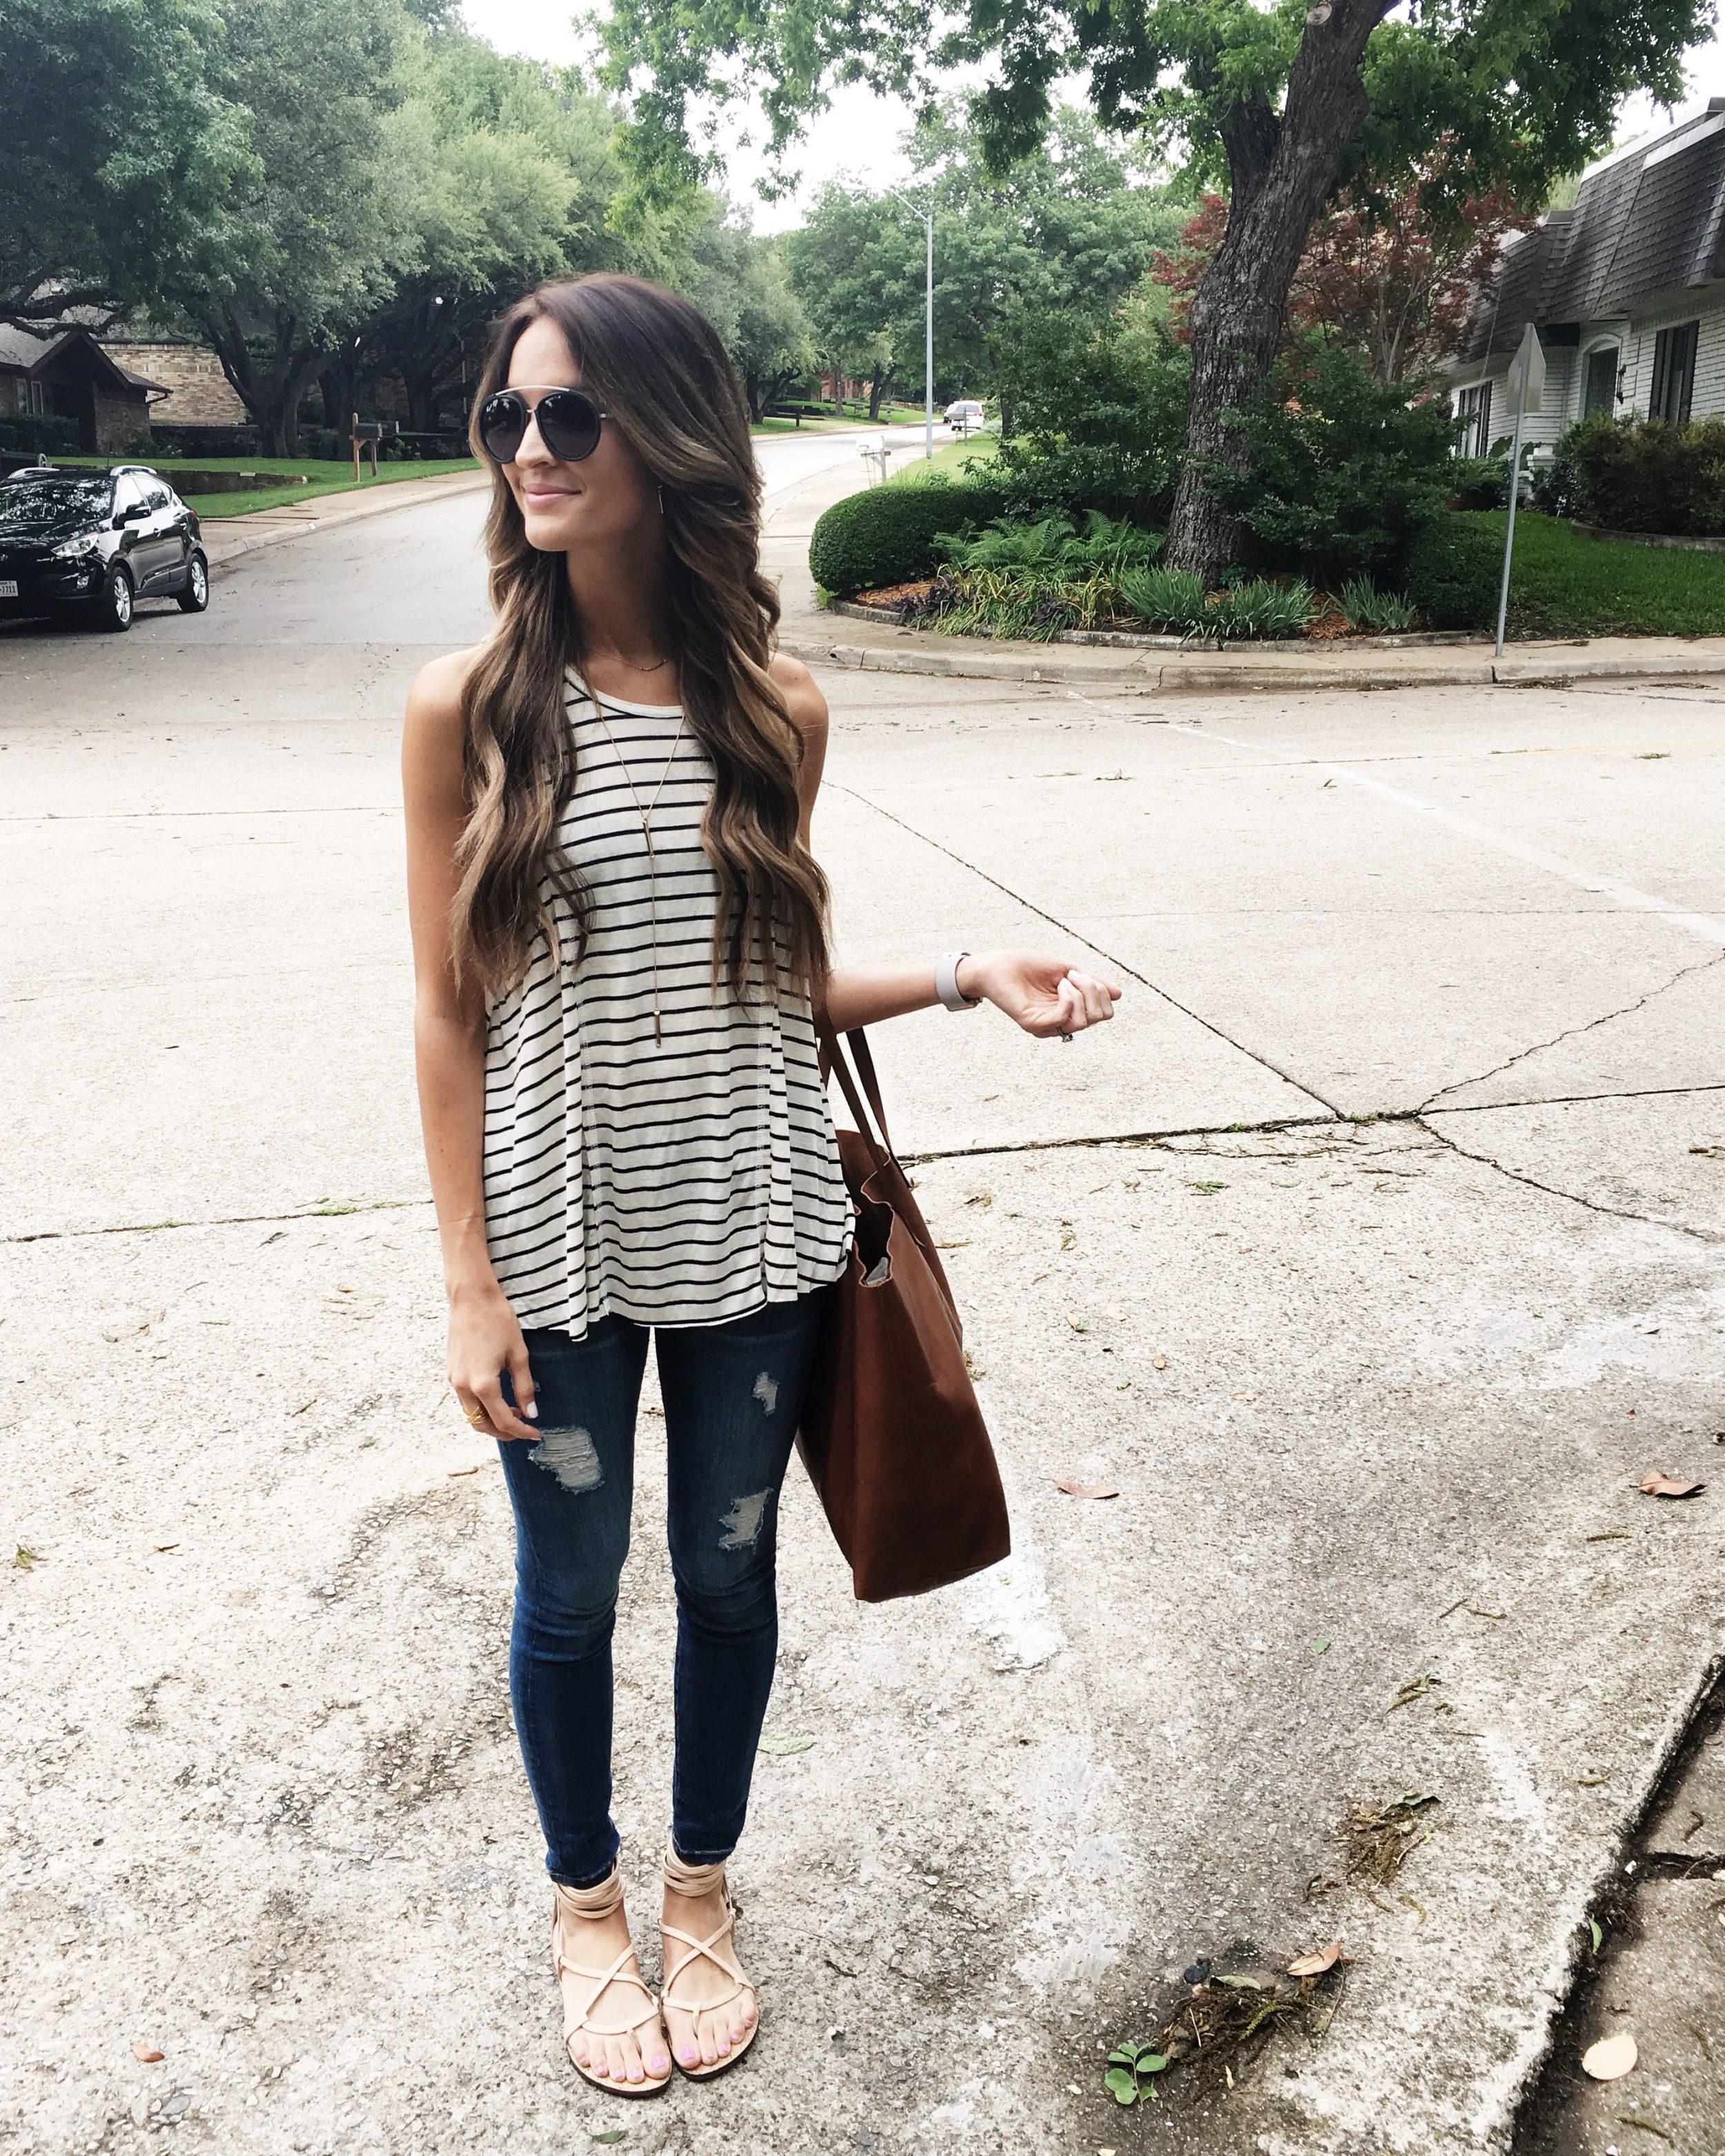 lauren kay sims instagram round-up